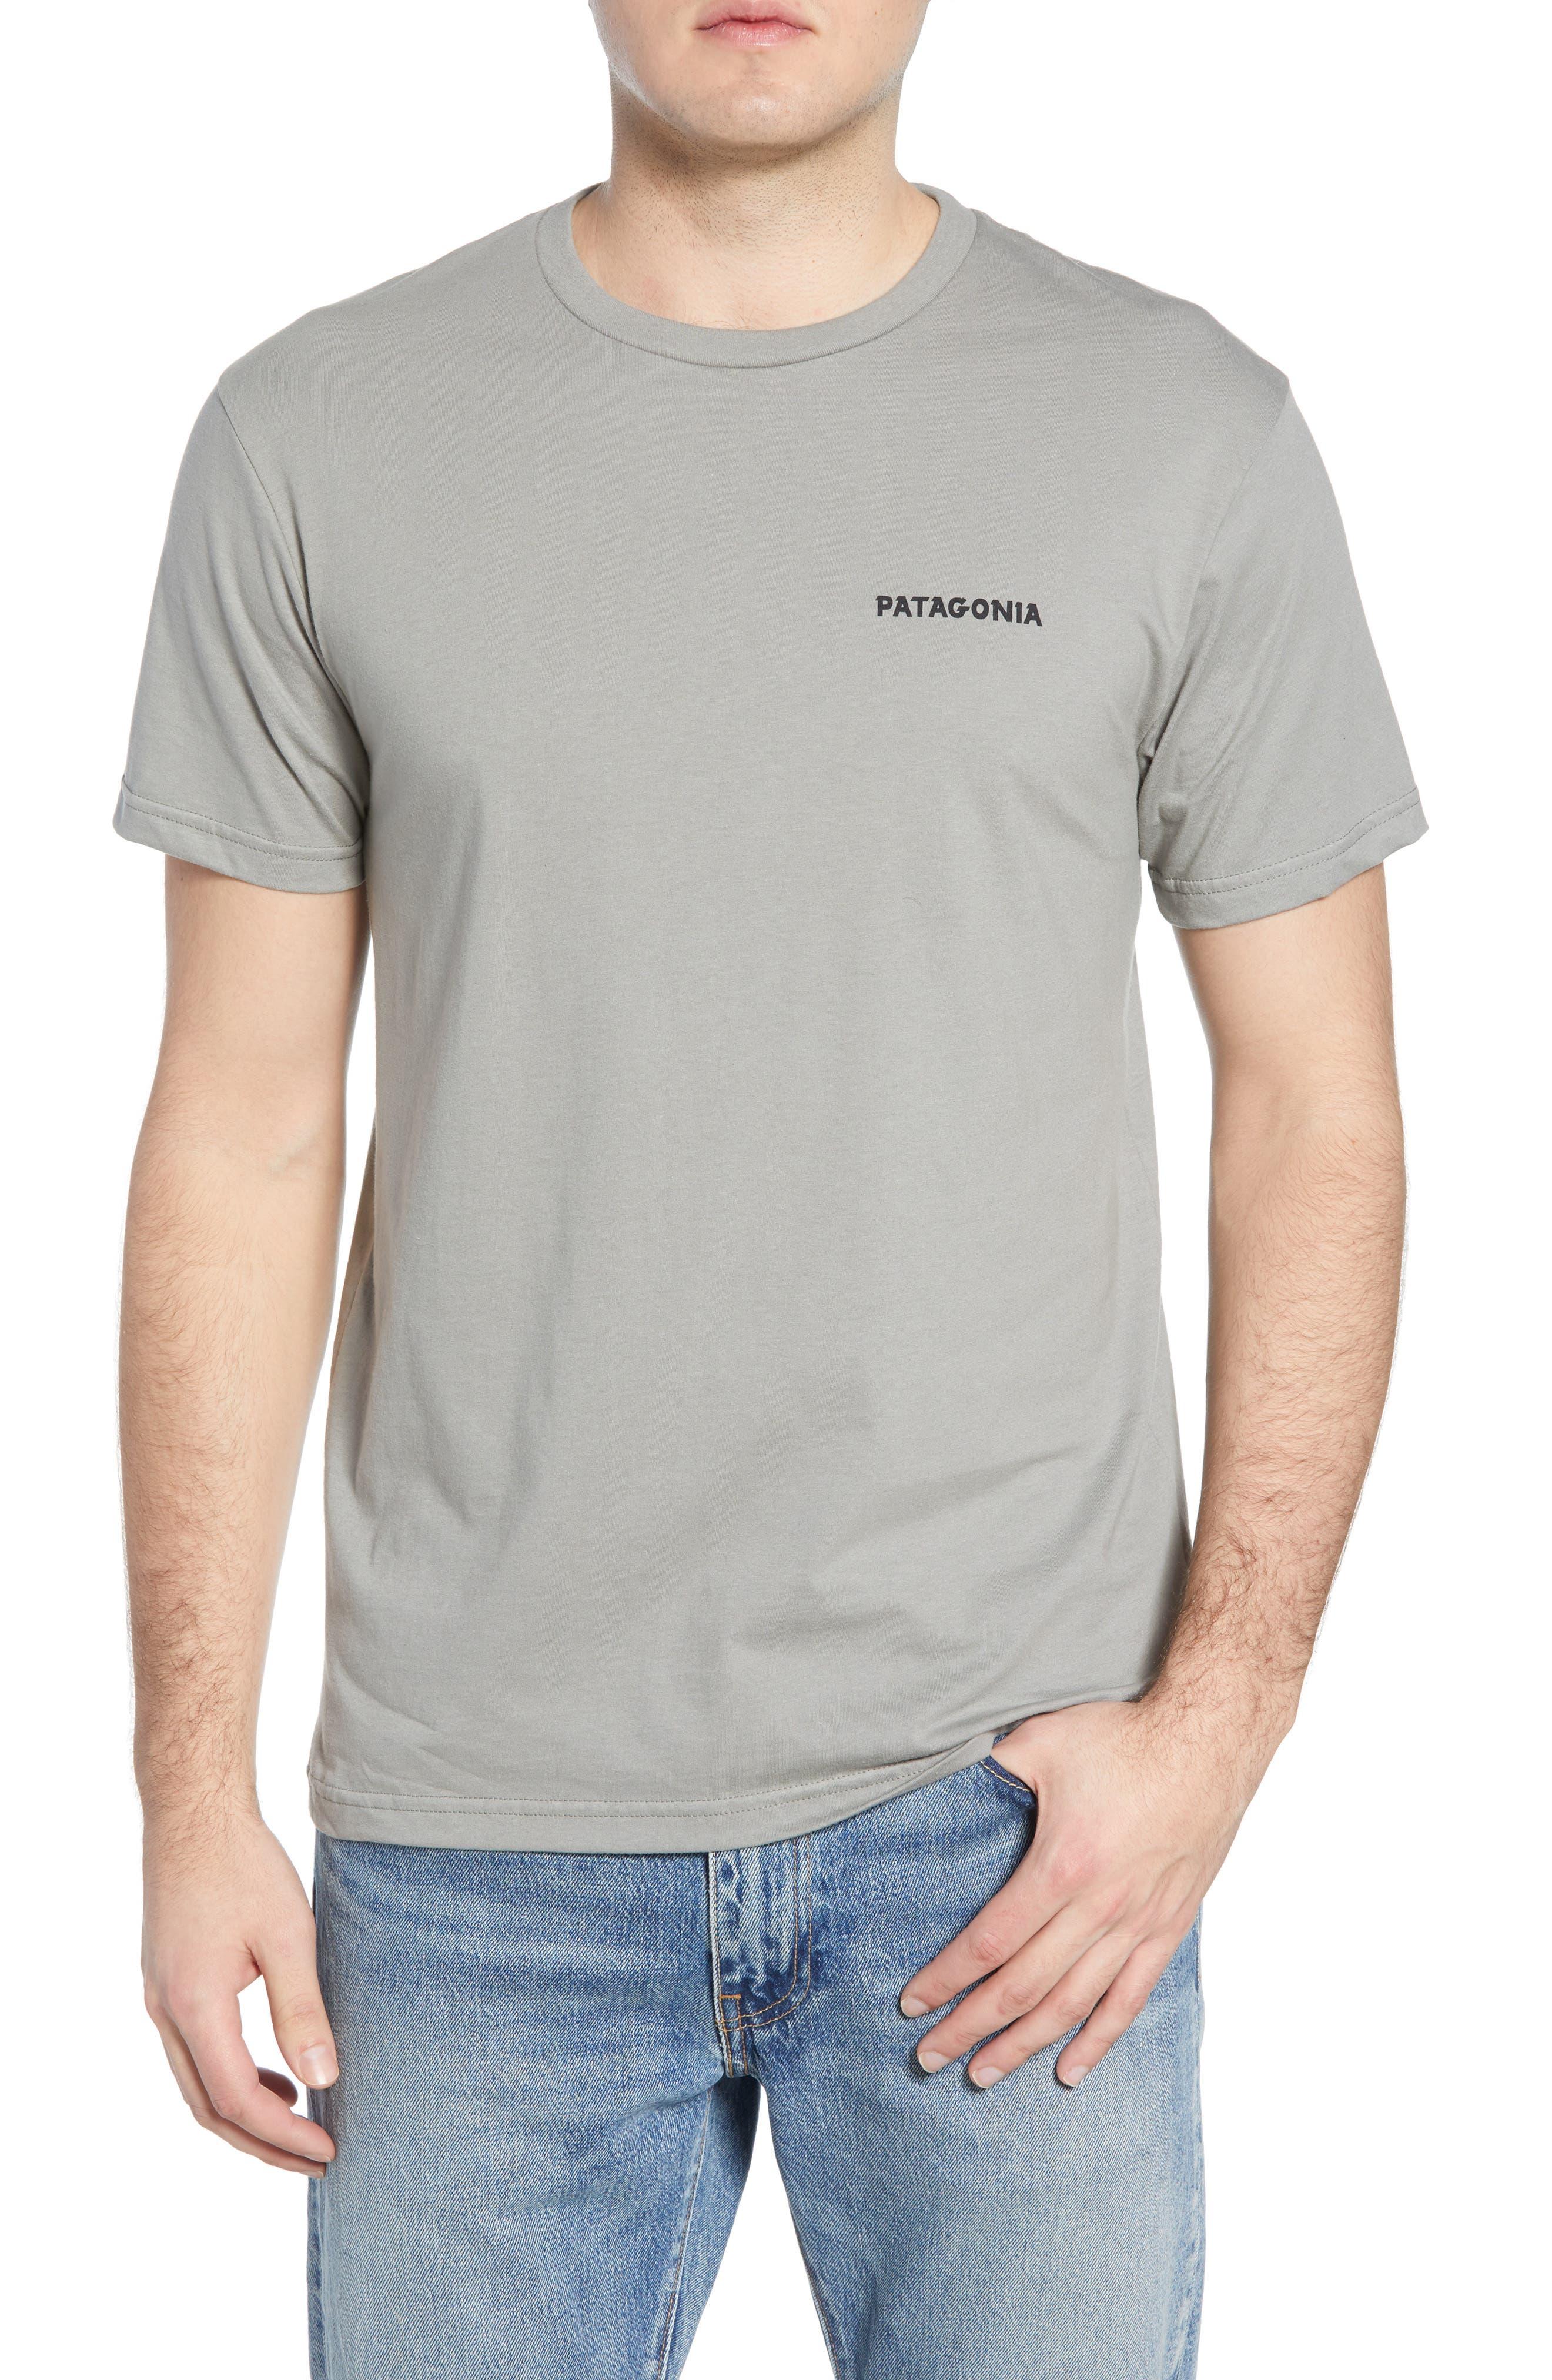 Patagonia Knobby Lines Graphic Organic Cotton T-Shirt, Grey